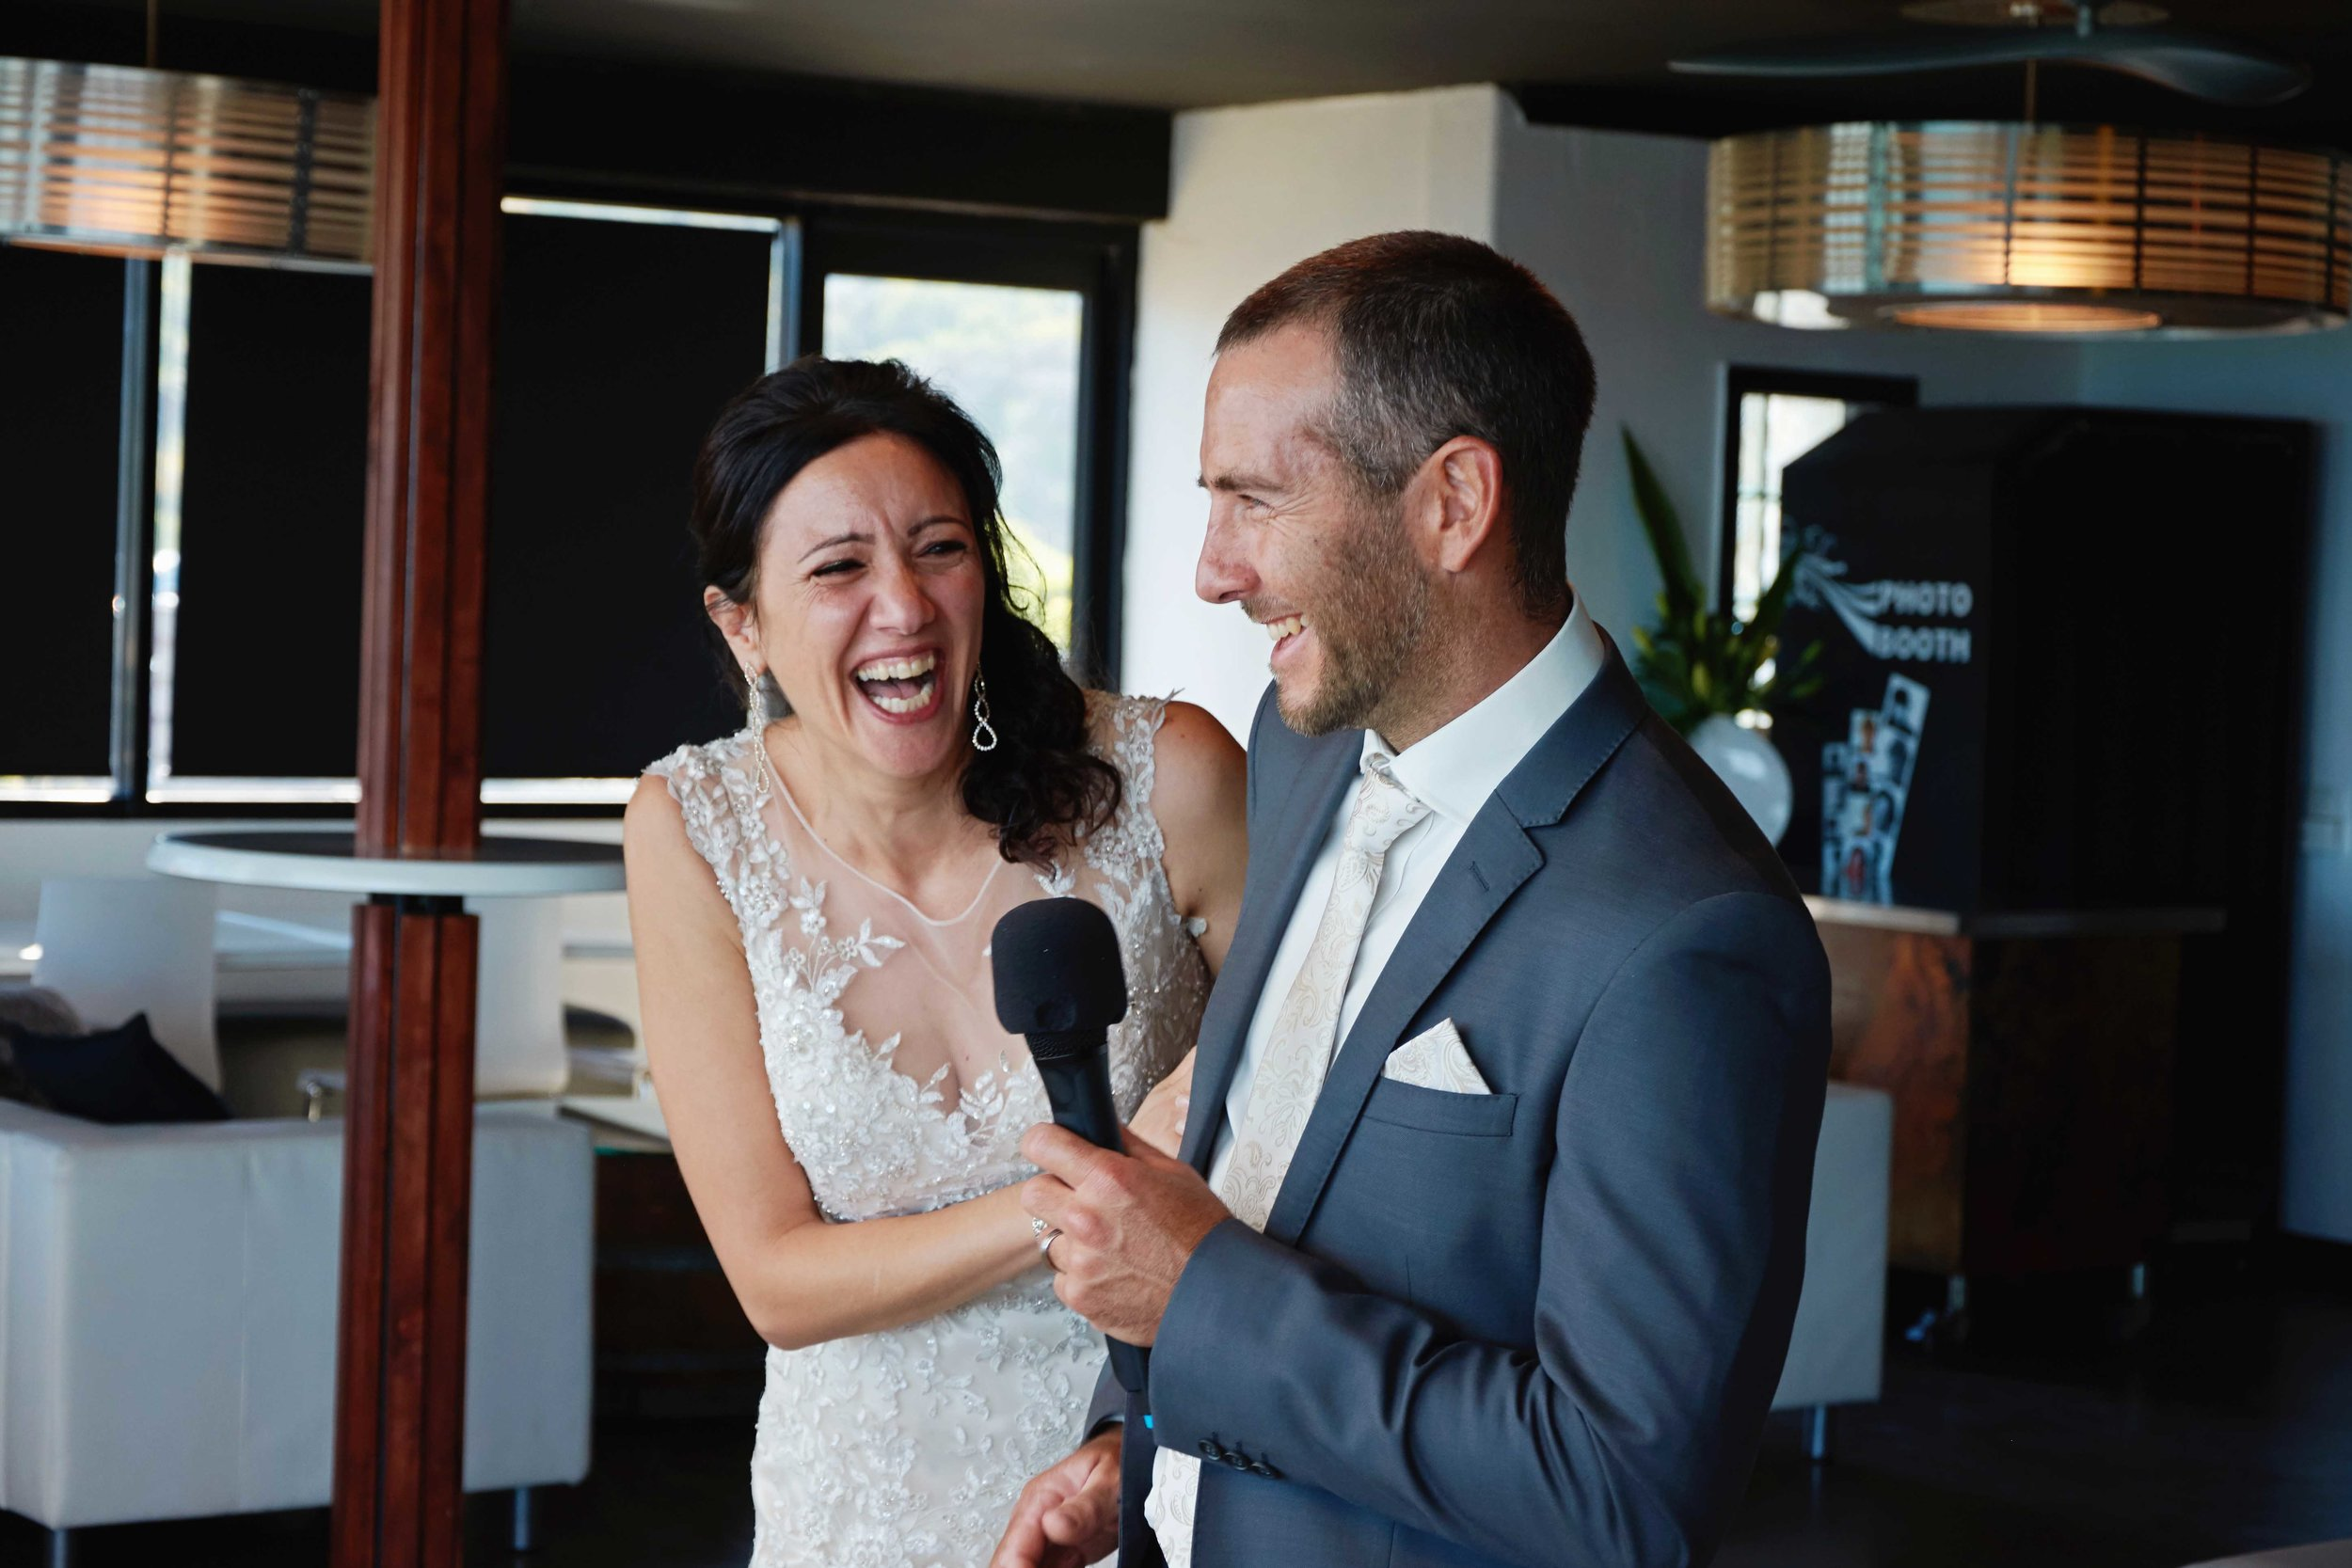 sorrento-wedding-photography-all-smiles-marissa-jade-photography-94.jpg